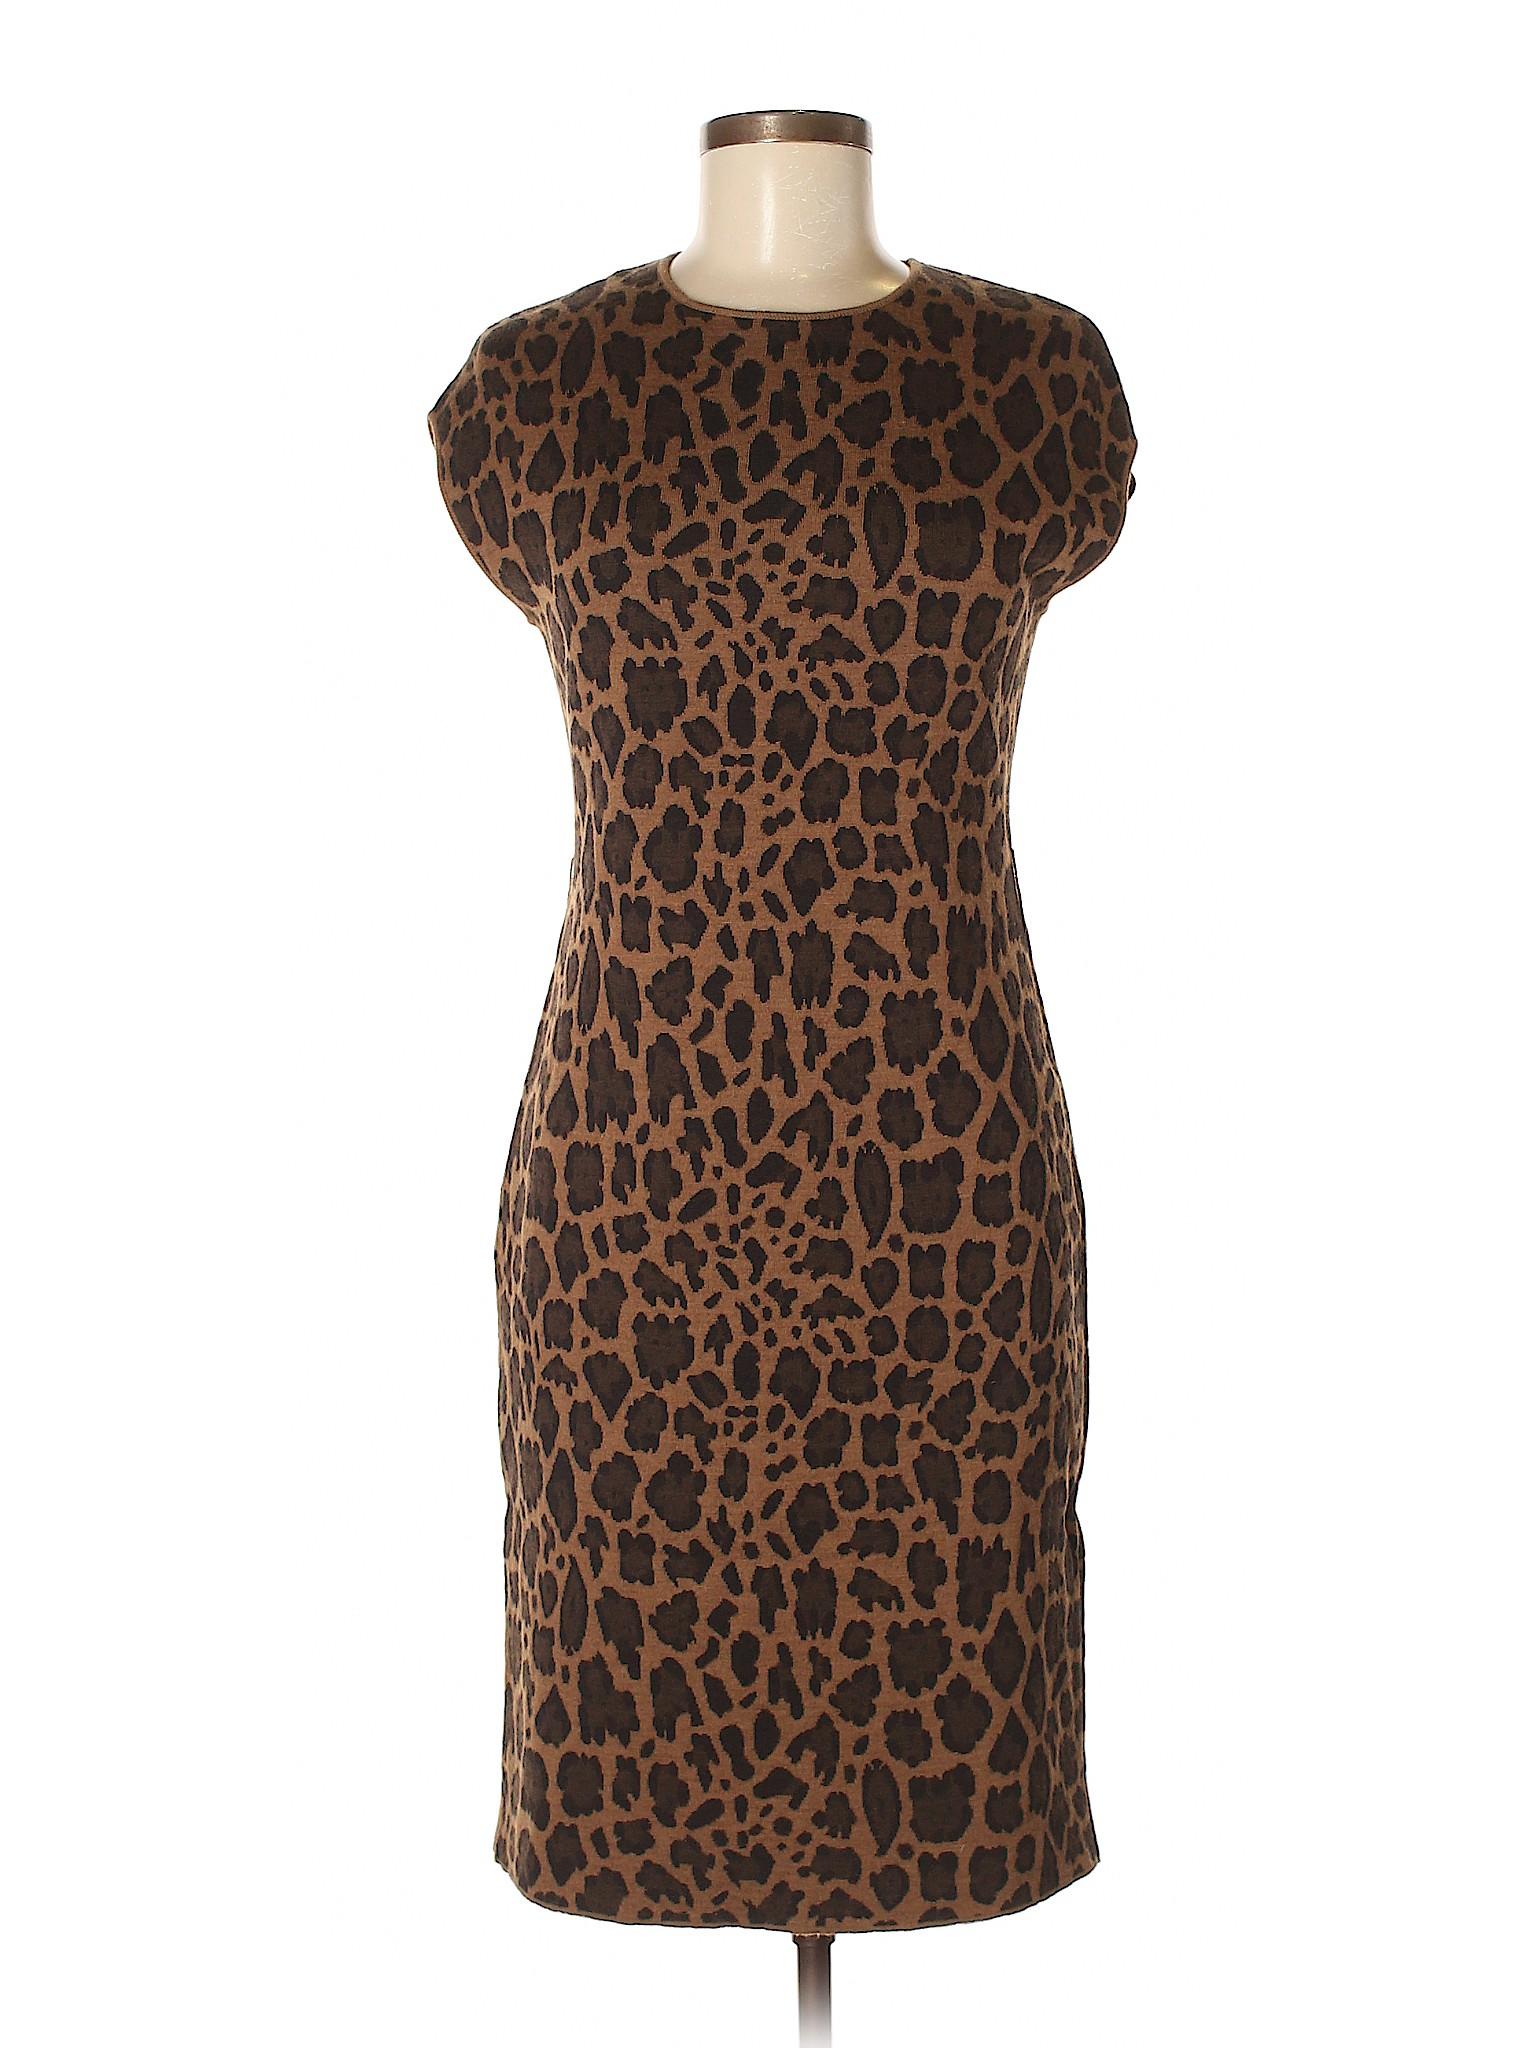 Herrera Boutique CH Dress Casual Carolina winter Fqtxnqp